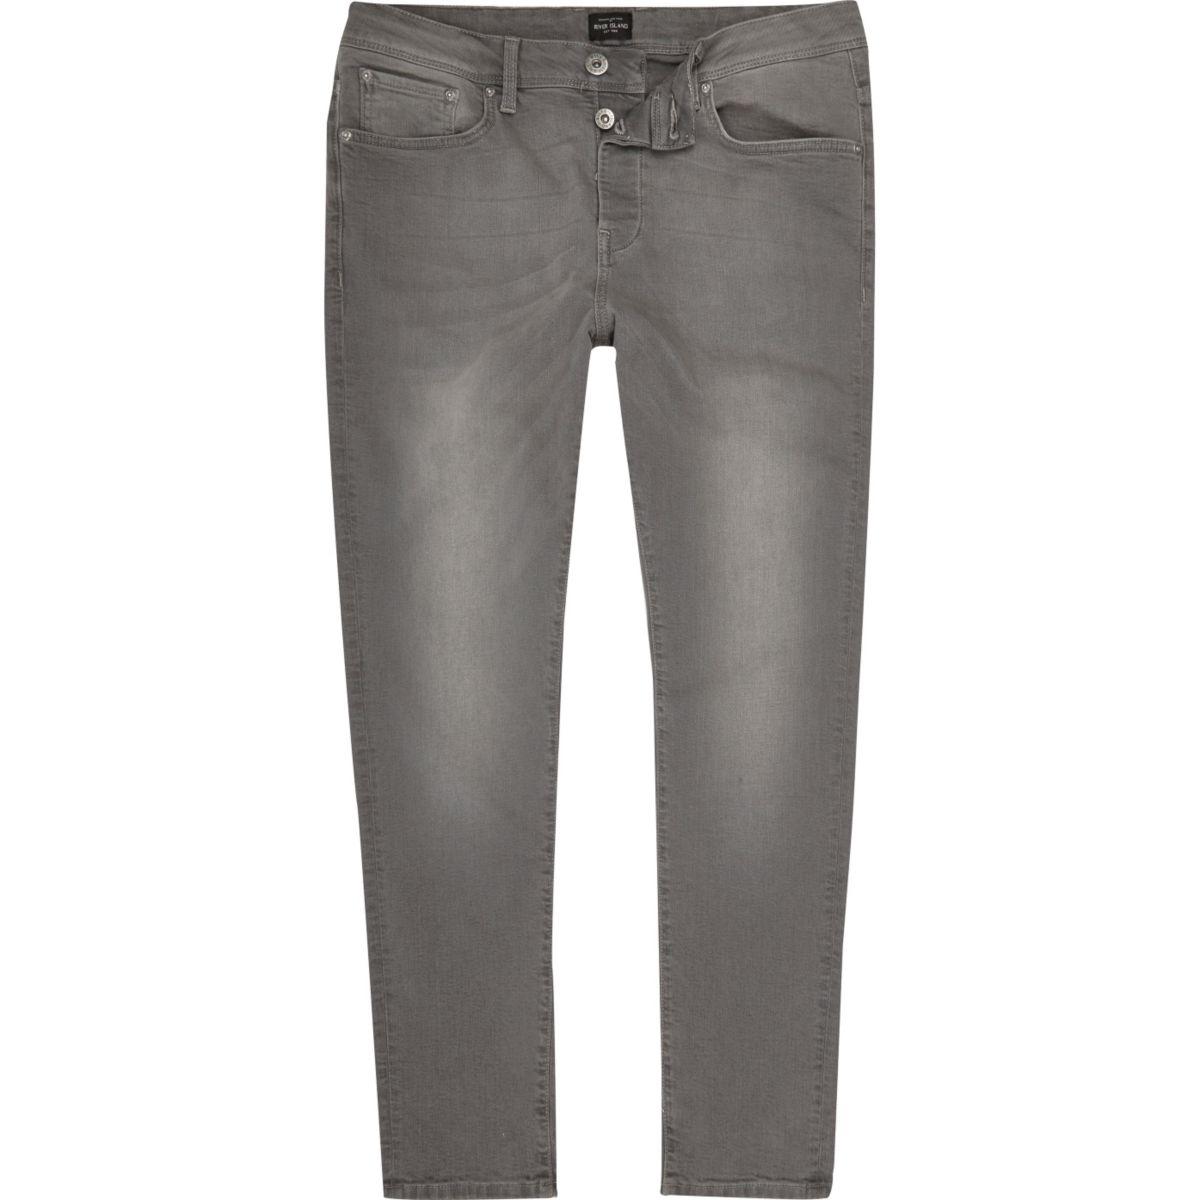 Light grey Jimmy slim tapered jeans